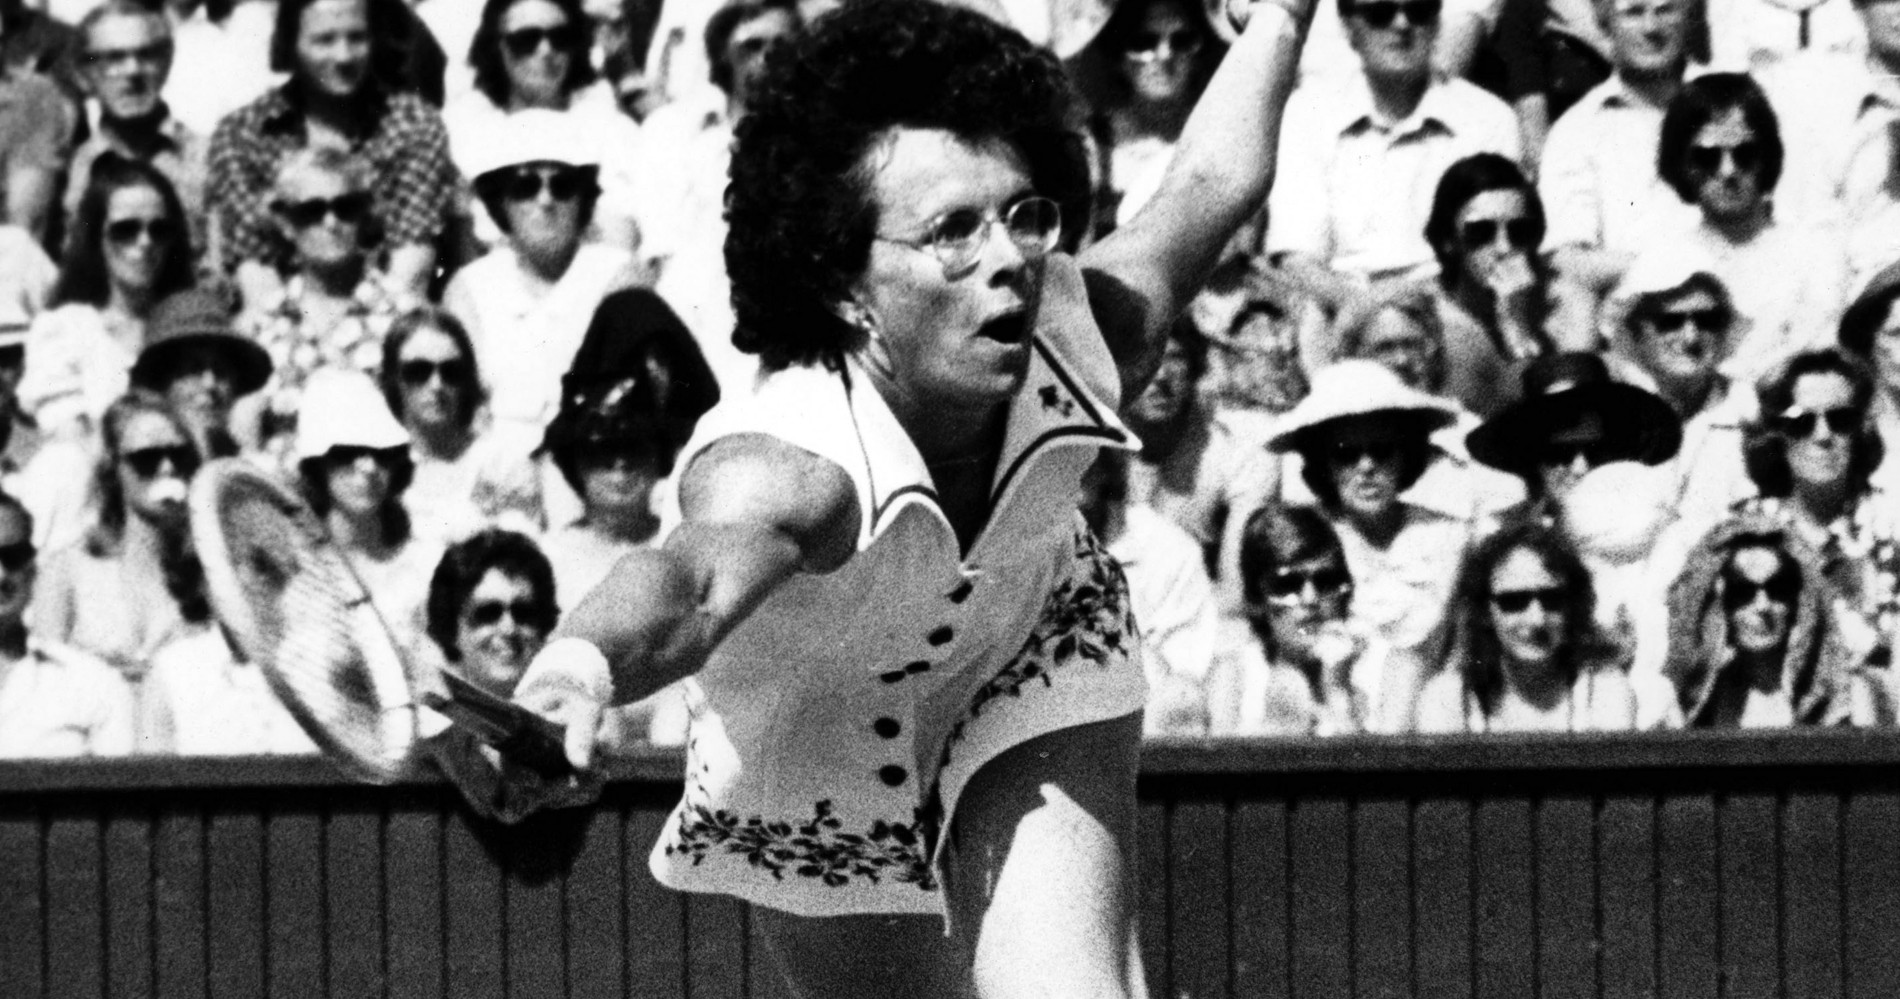 Billie Jean King during 1975 Wimbledon